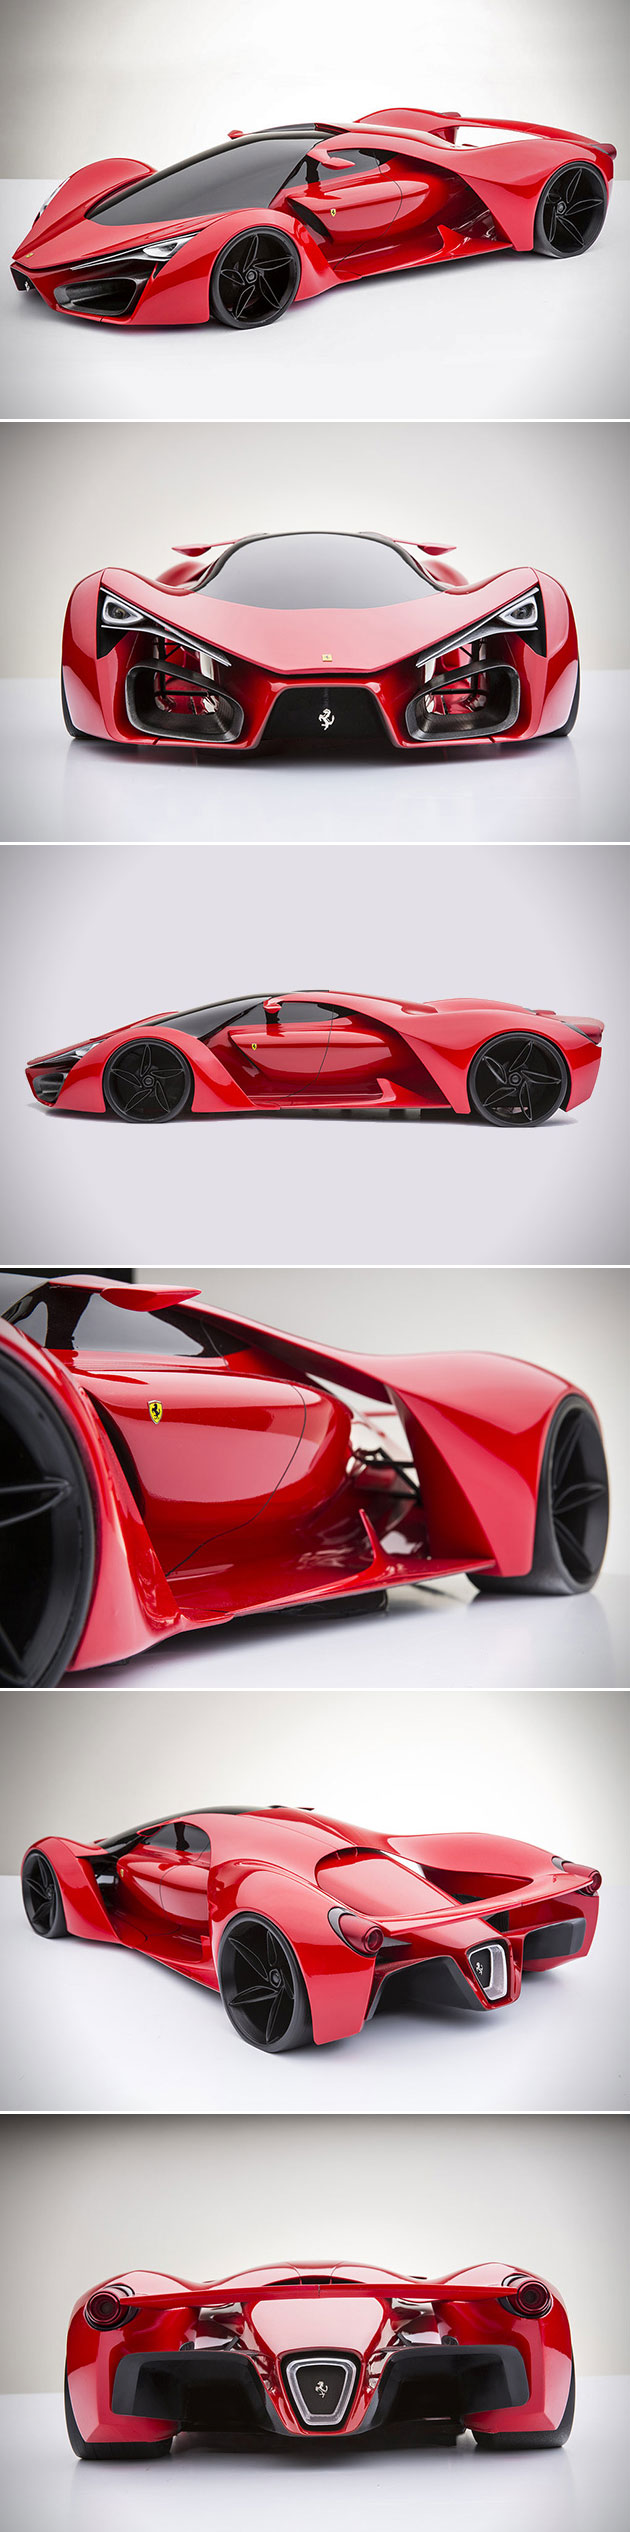 Ferrari Hypercar